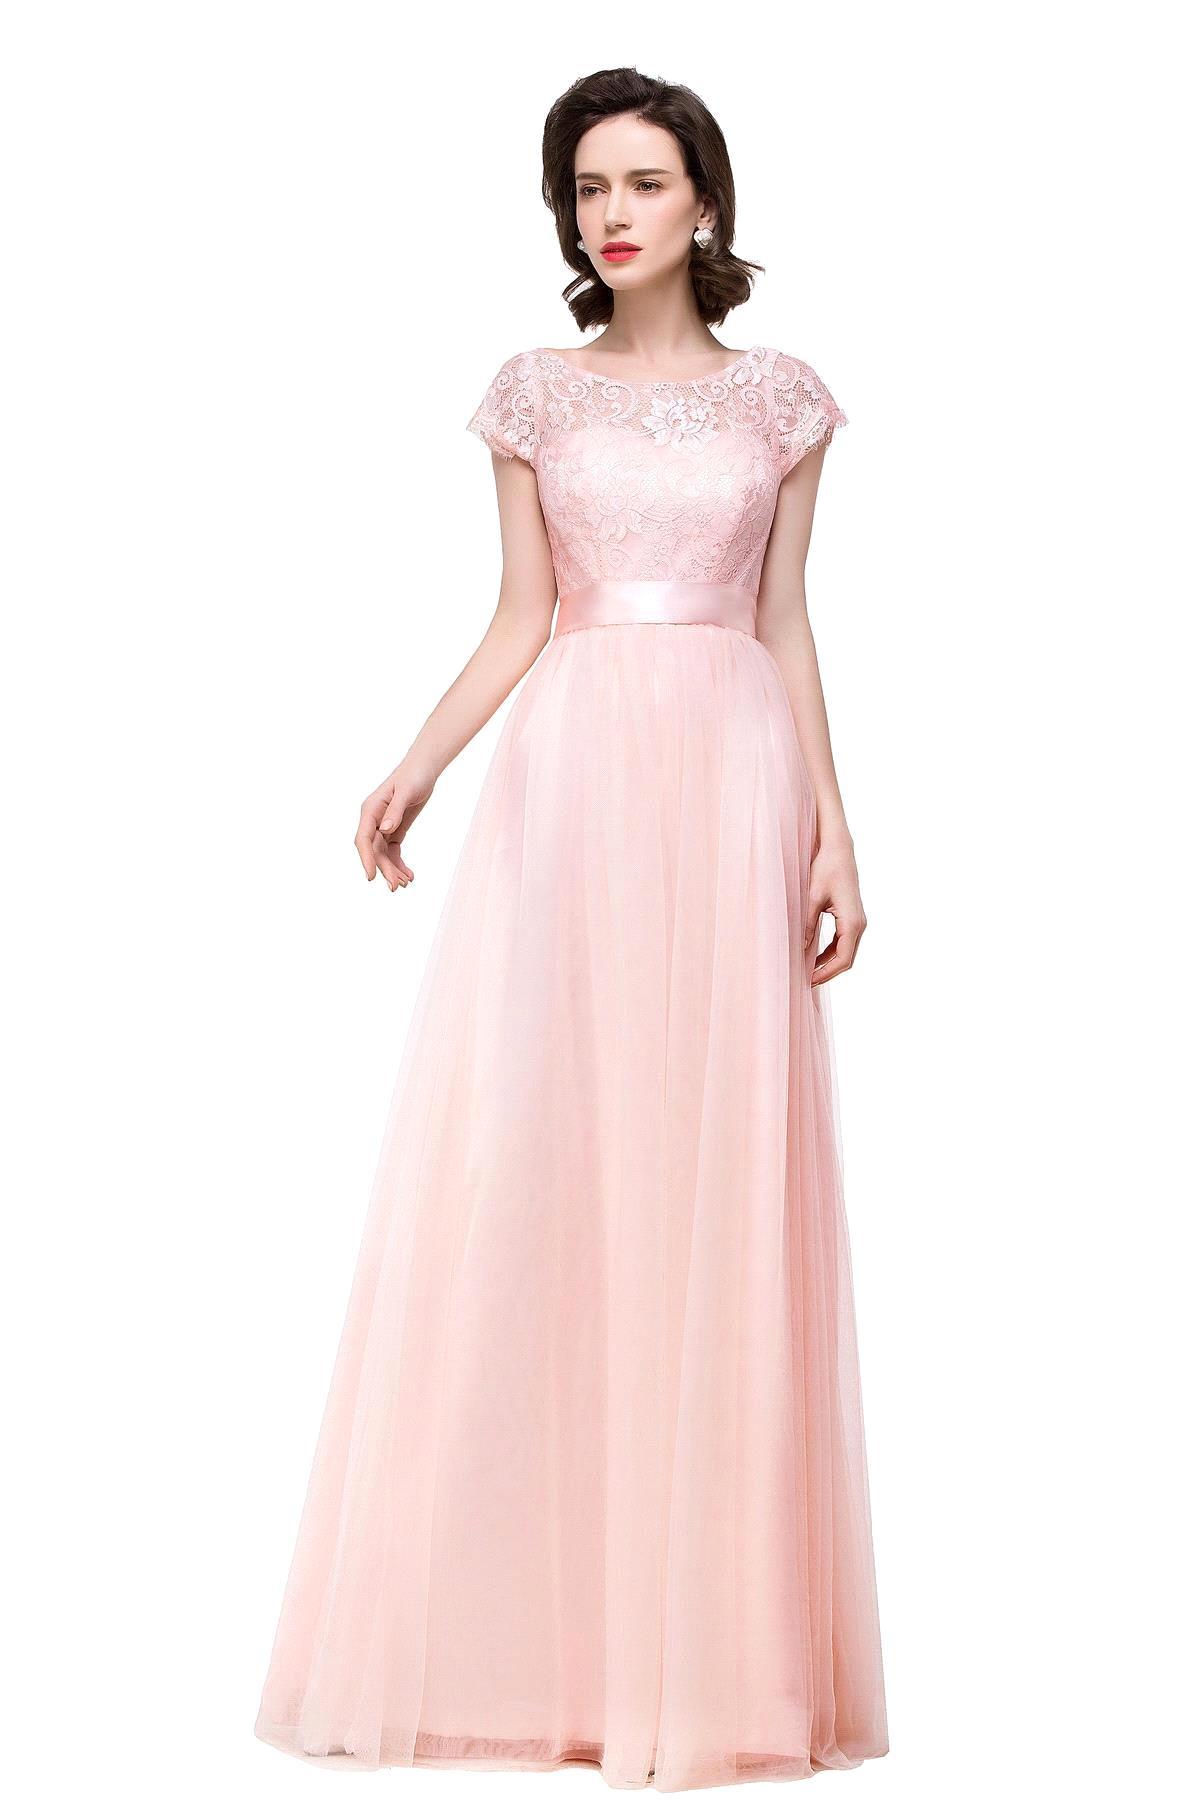 Popular pink lace short bridesmaid dress buy cheap pink lace short robe demoiselle dhonneur custom make blush pink lace bridesmaid dresses 2017 a line short ombrellifo Gallery